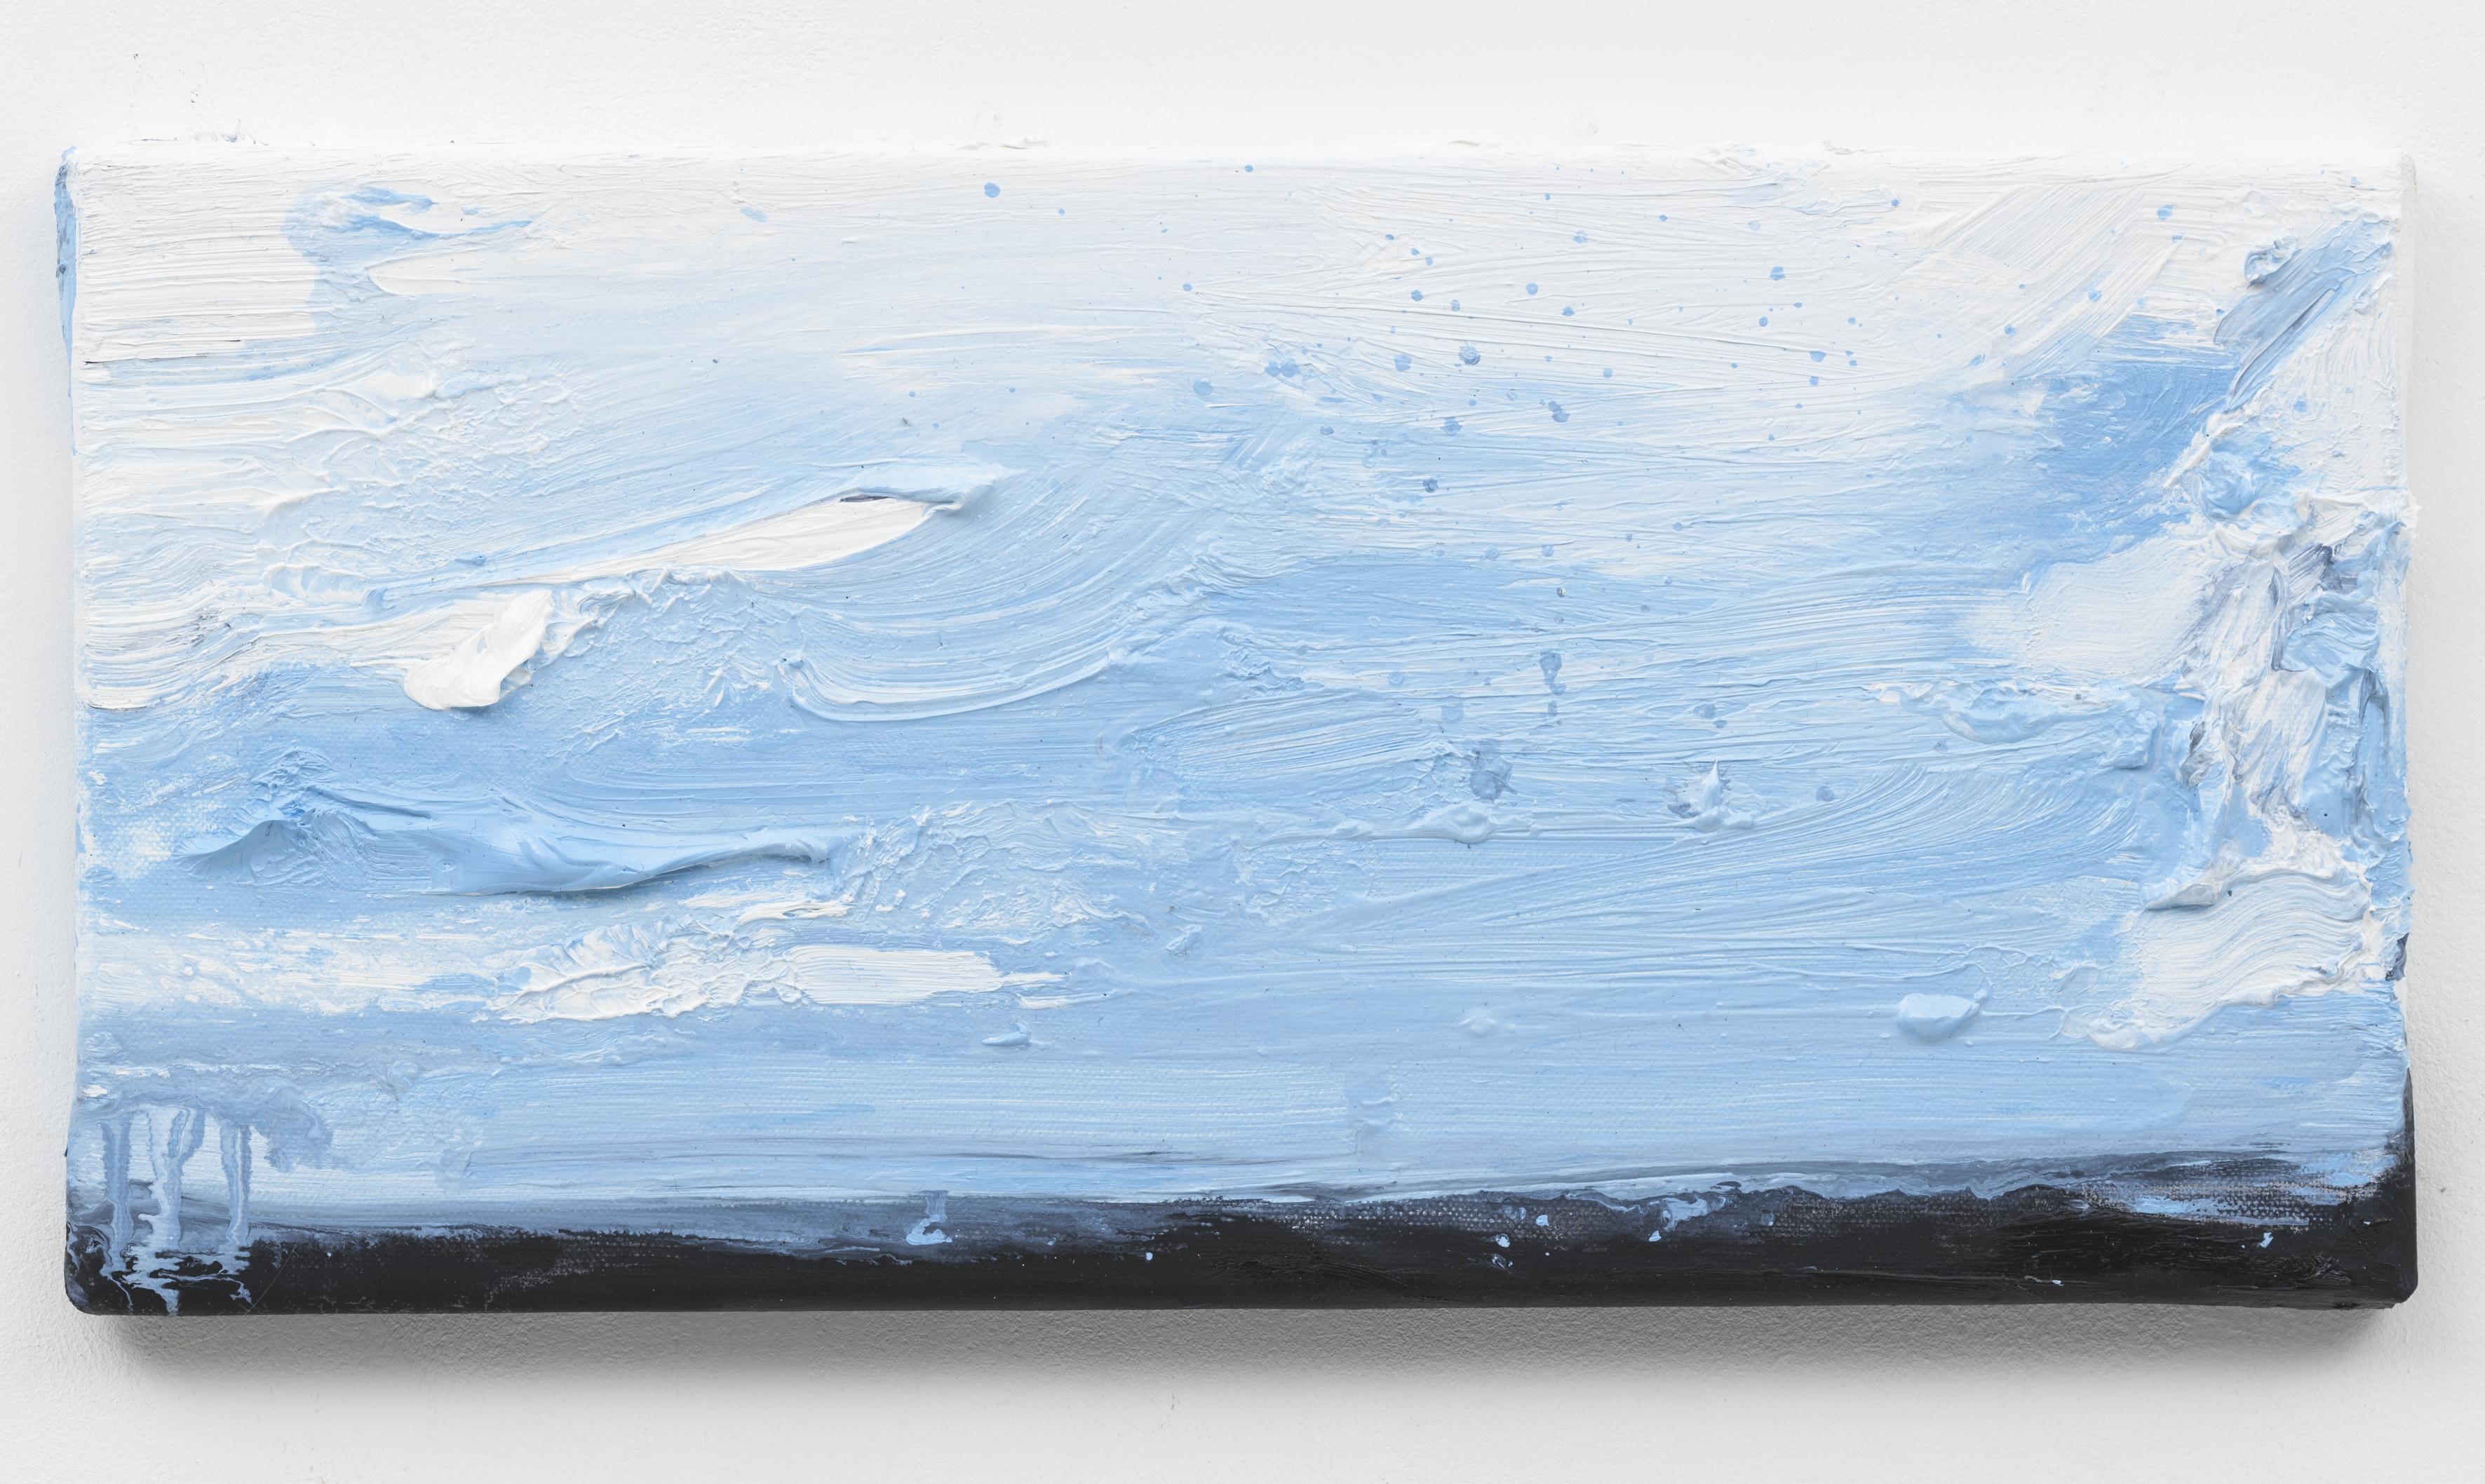 """Wanderung VIII, Berlin Suite"" 20 x 40 cm. oil on linen 2018 (Special Edition., Berlin)"